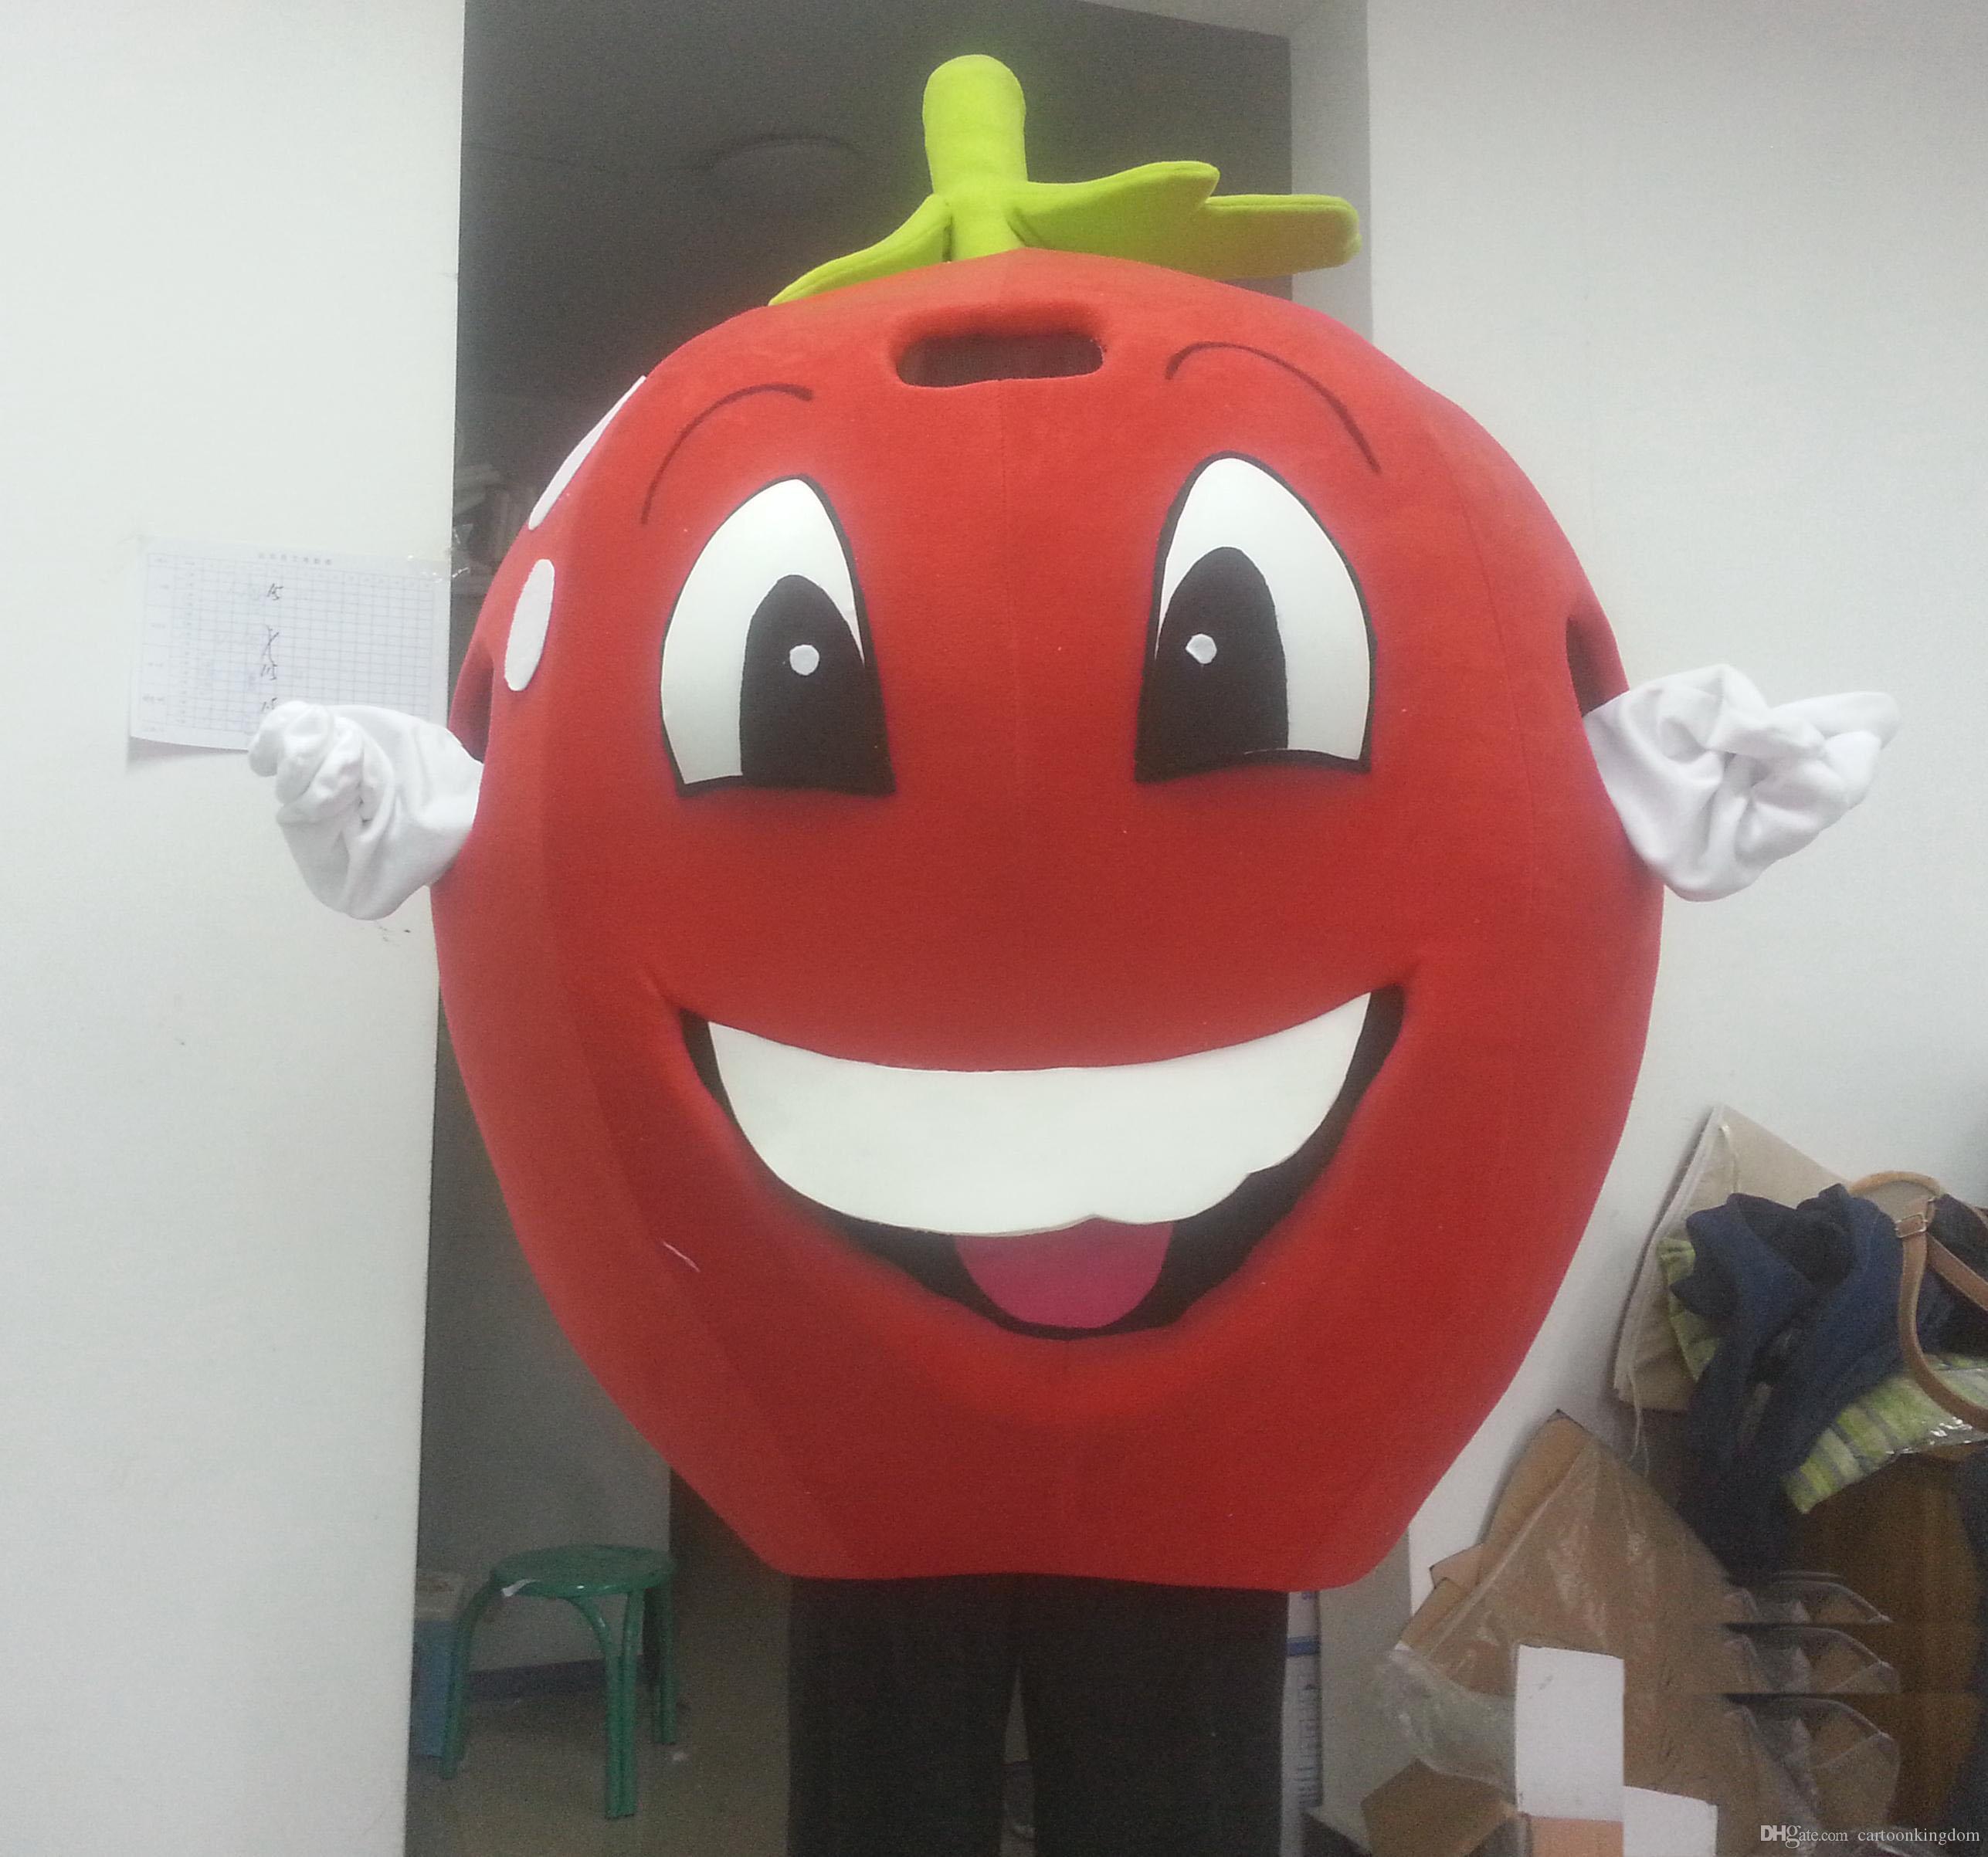 2019 Fabrika doğrudan satış Kırmızı elma Maskot Kostüm meyve Karikatür Giyim reklam